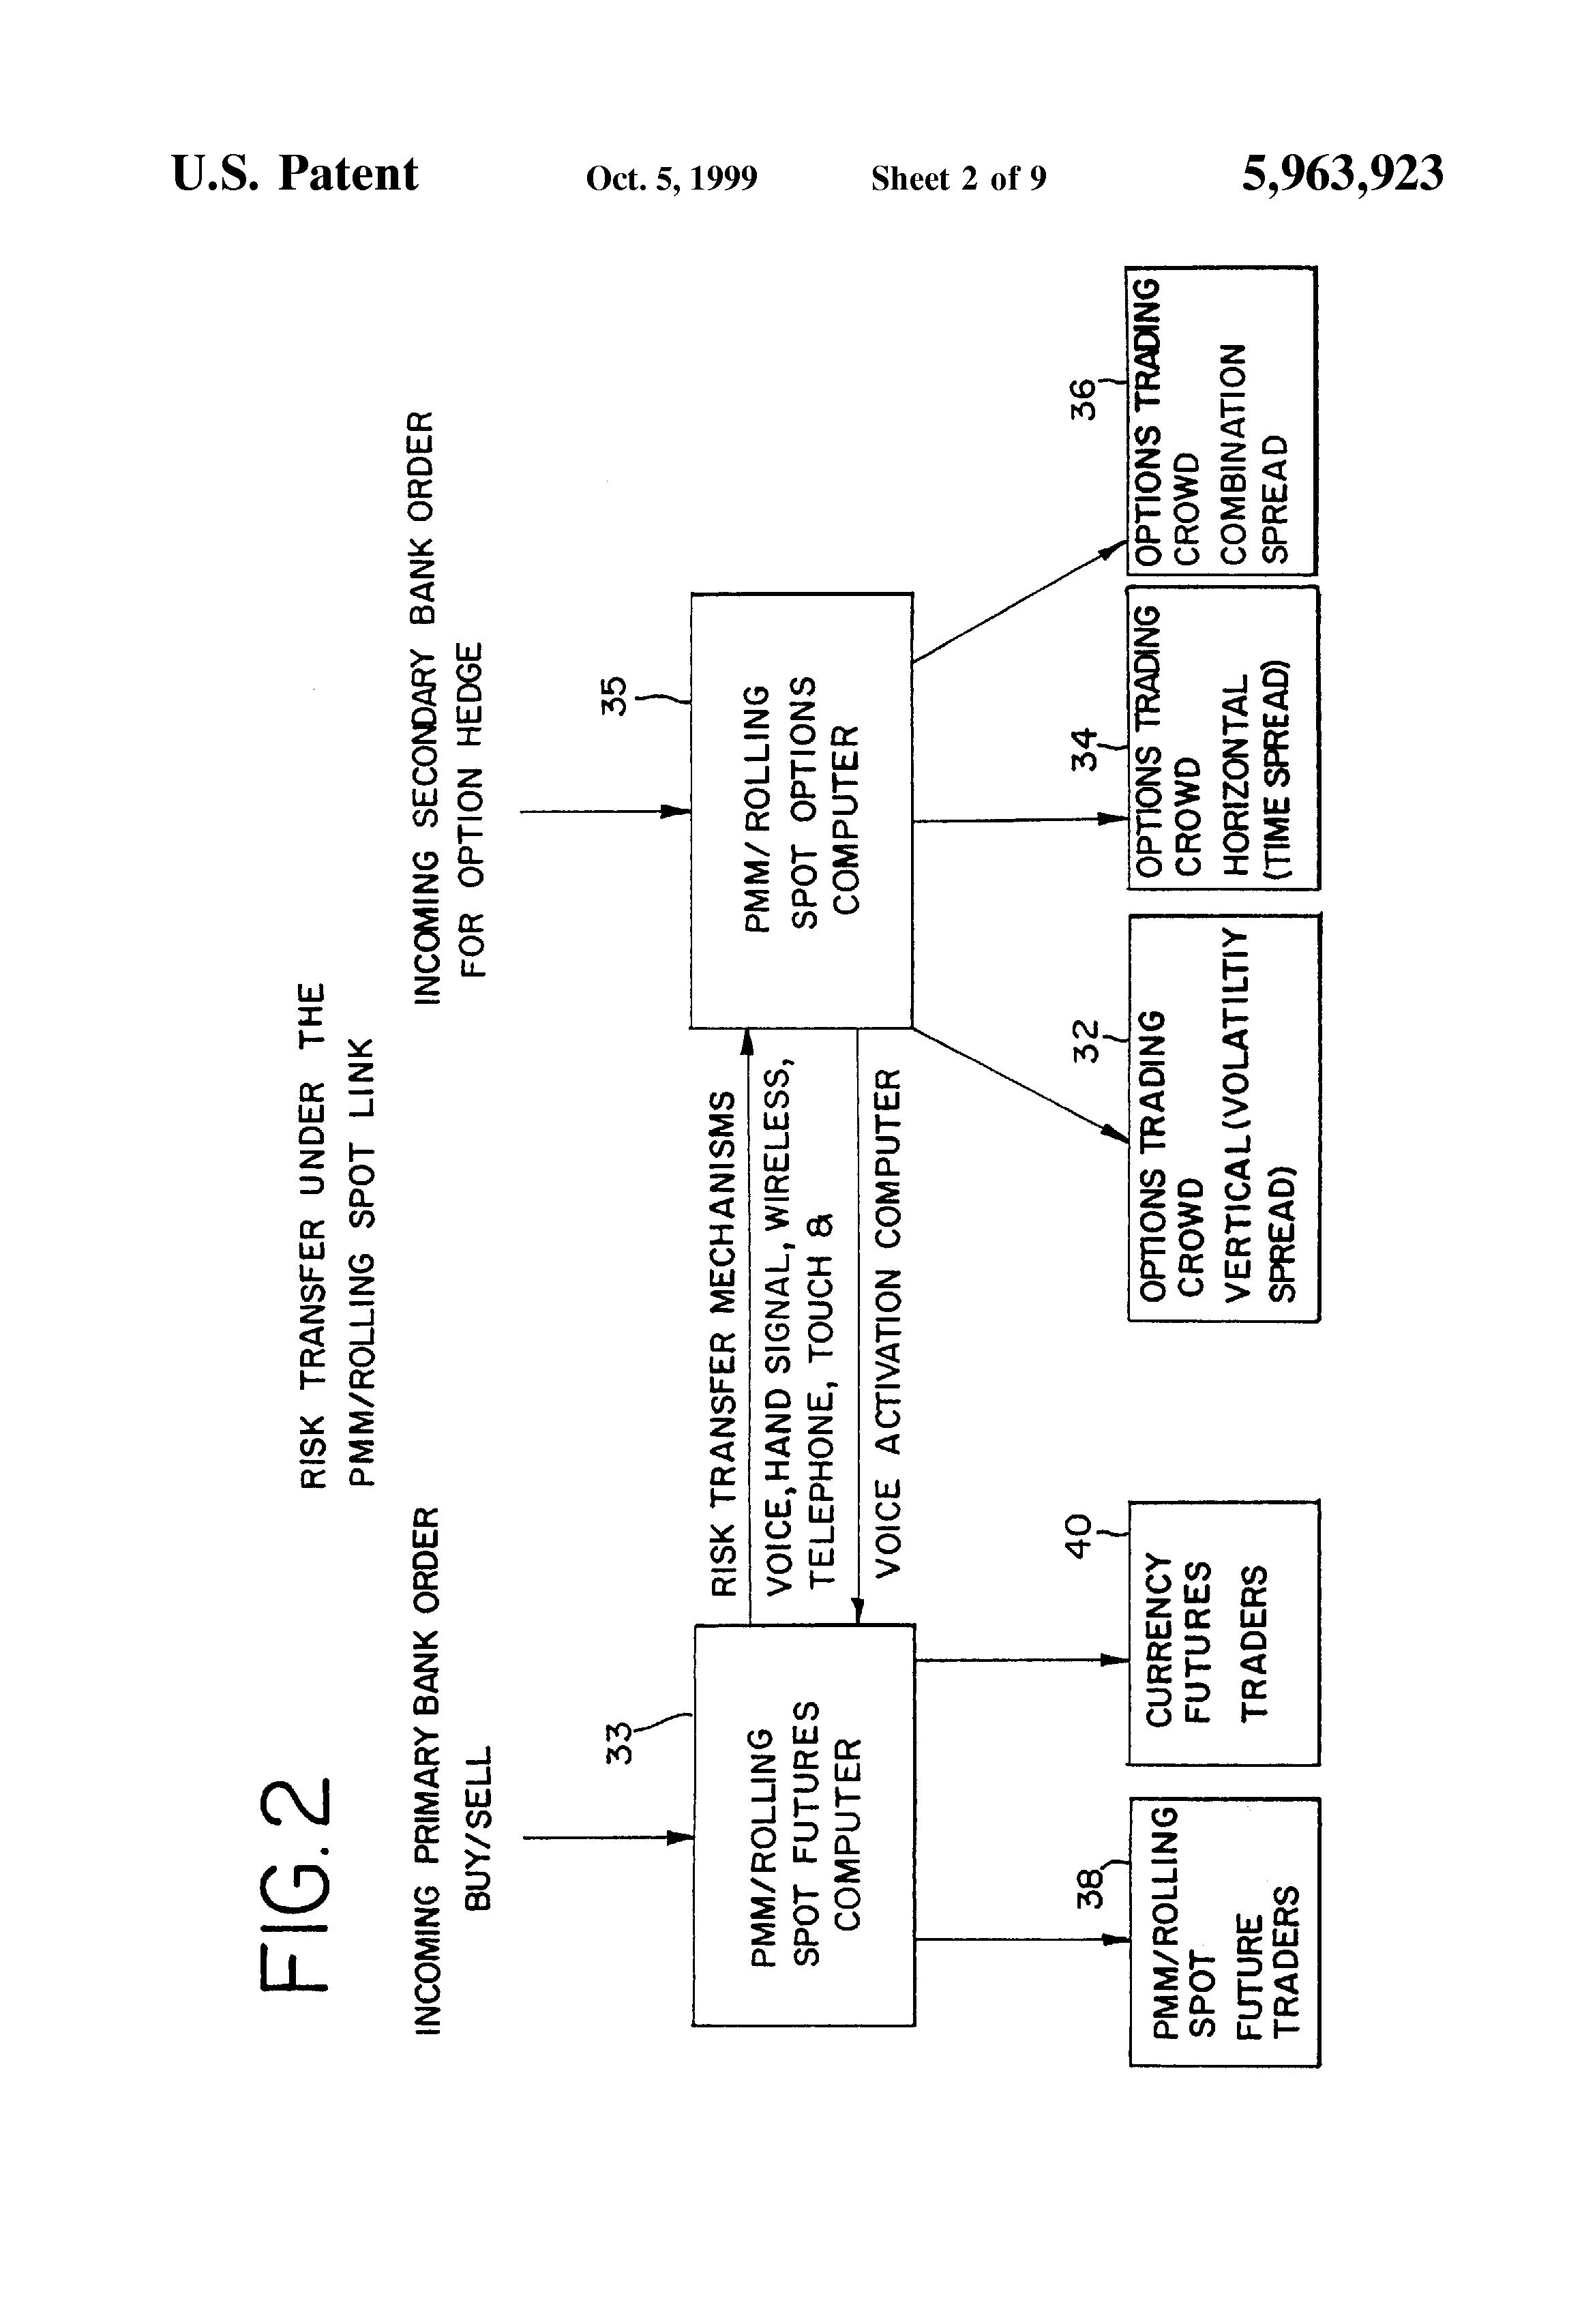 Bi-directional options trade